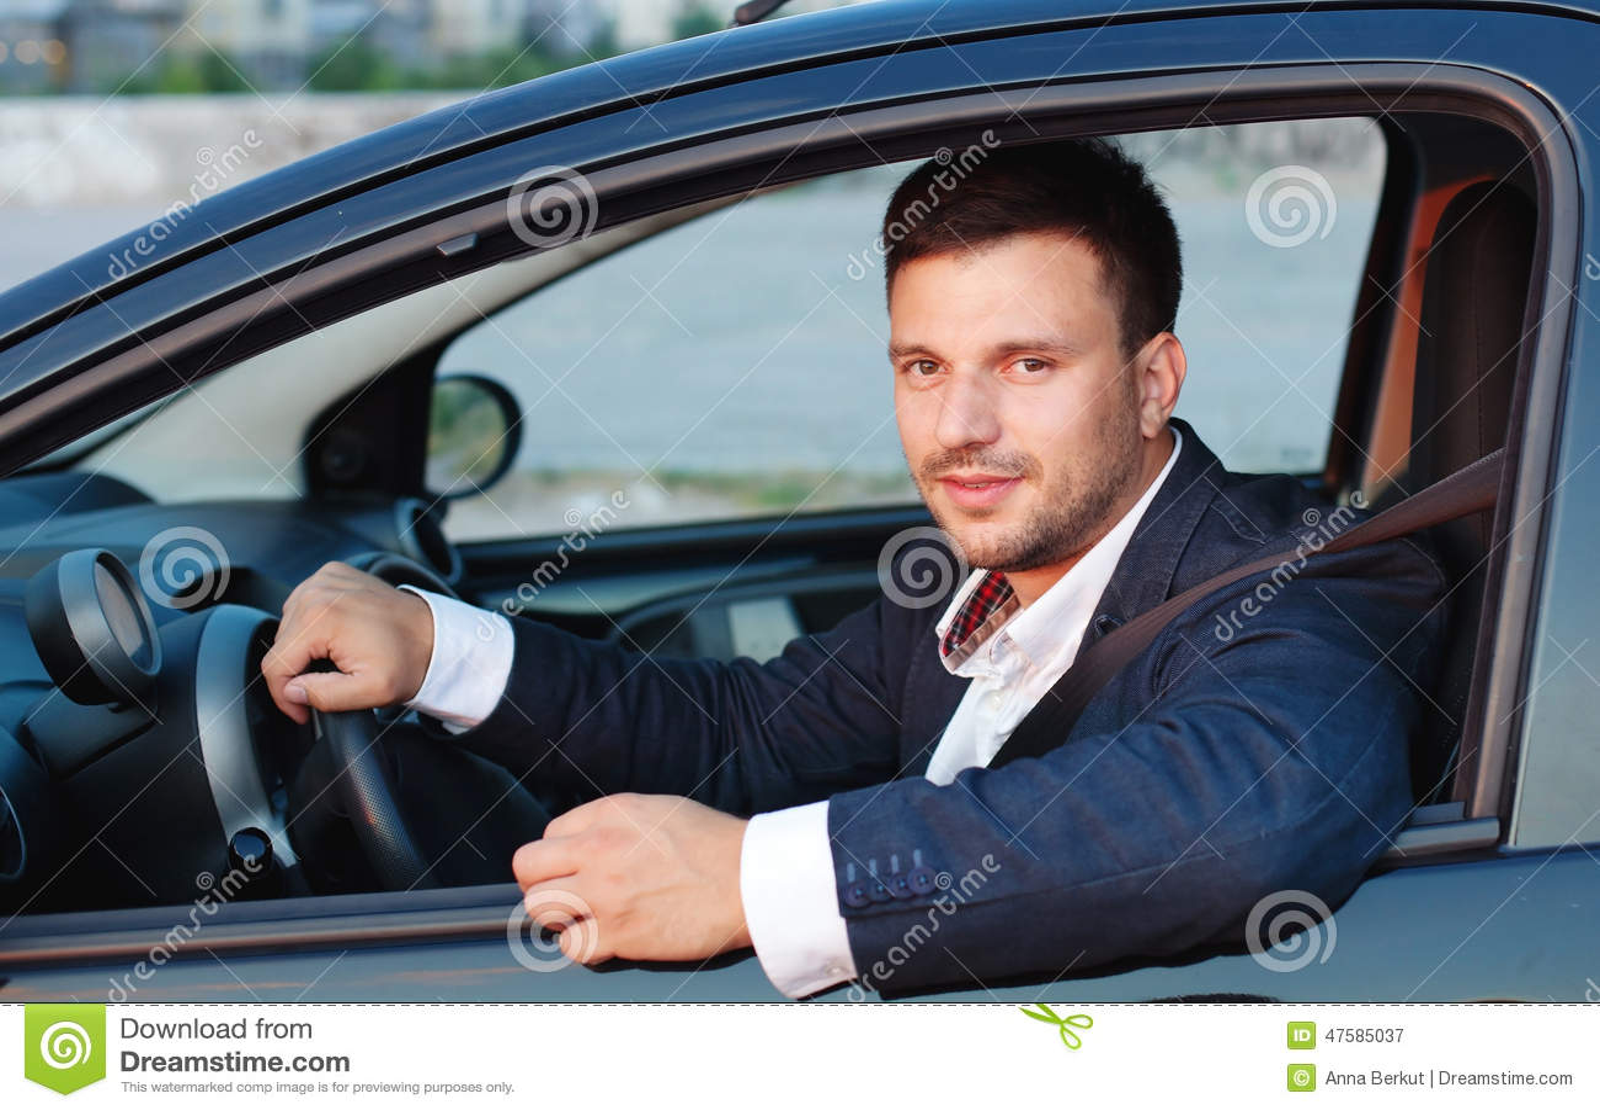 Taxi Car Loan